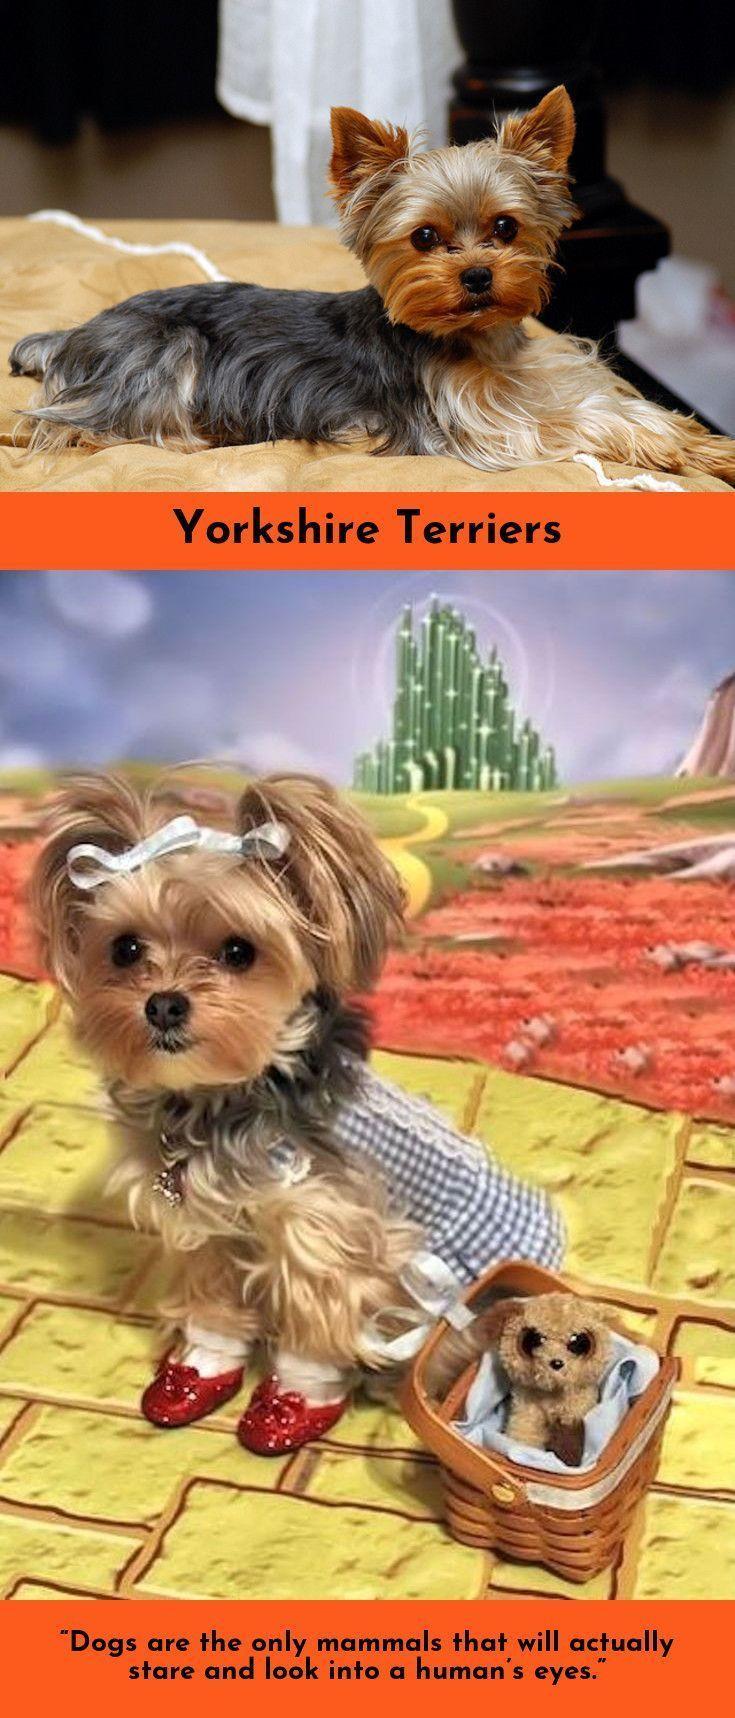 Wake Up Hug Dog Have A Good Day Yorkshire Terriers Yorkshireterrier Yorkielove Yorkshire Terrier Yorkshire Terrier Dog Terrier